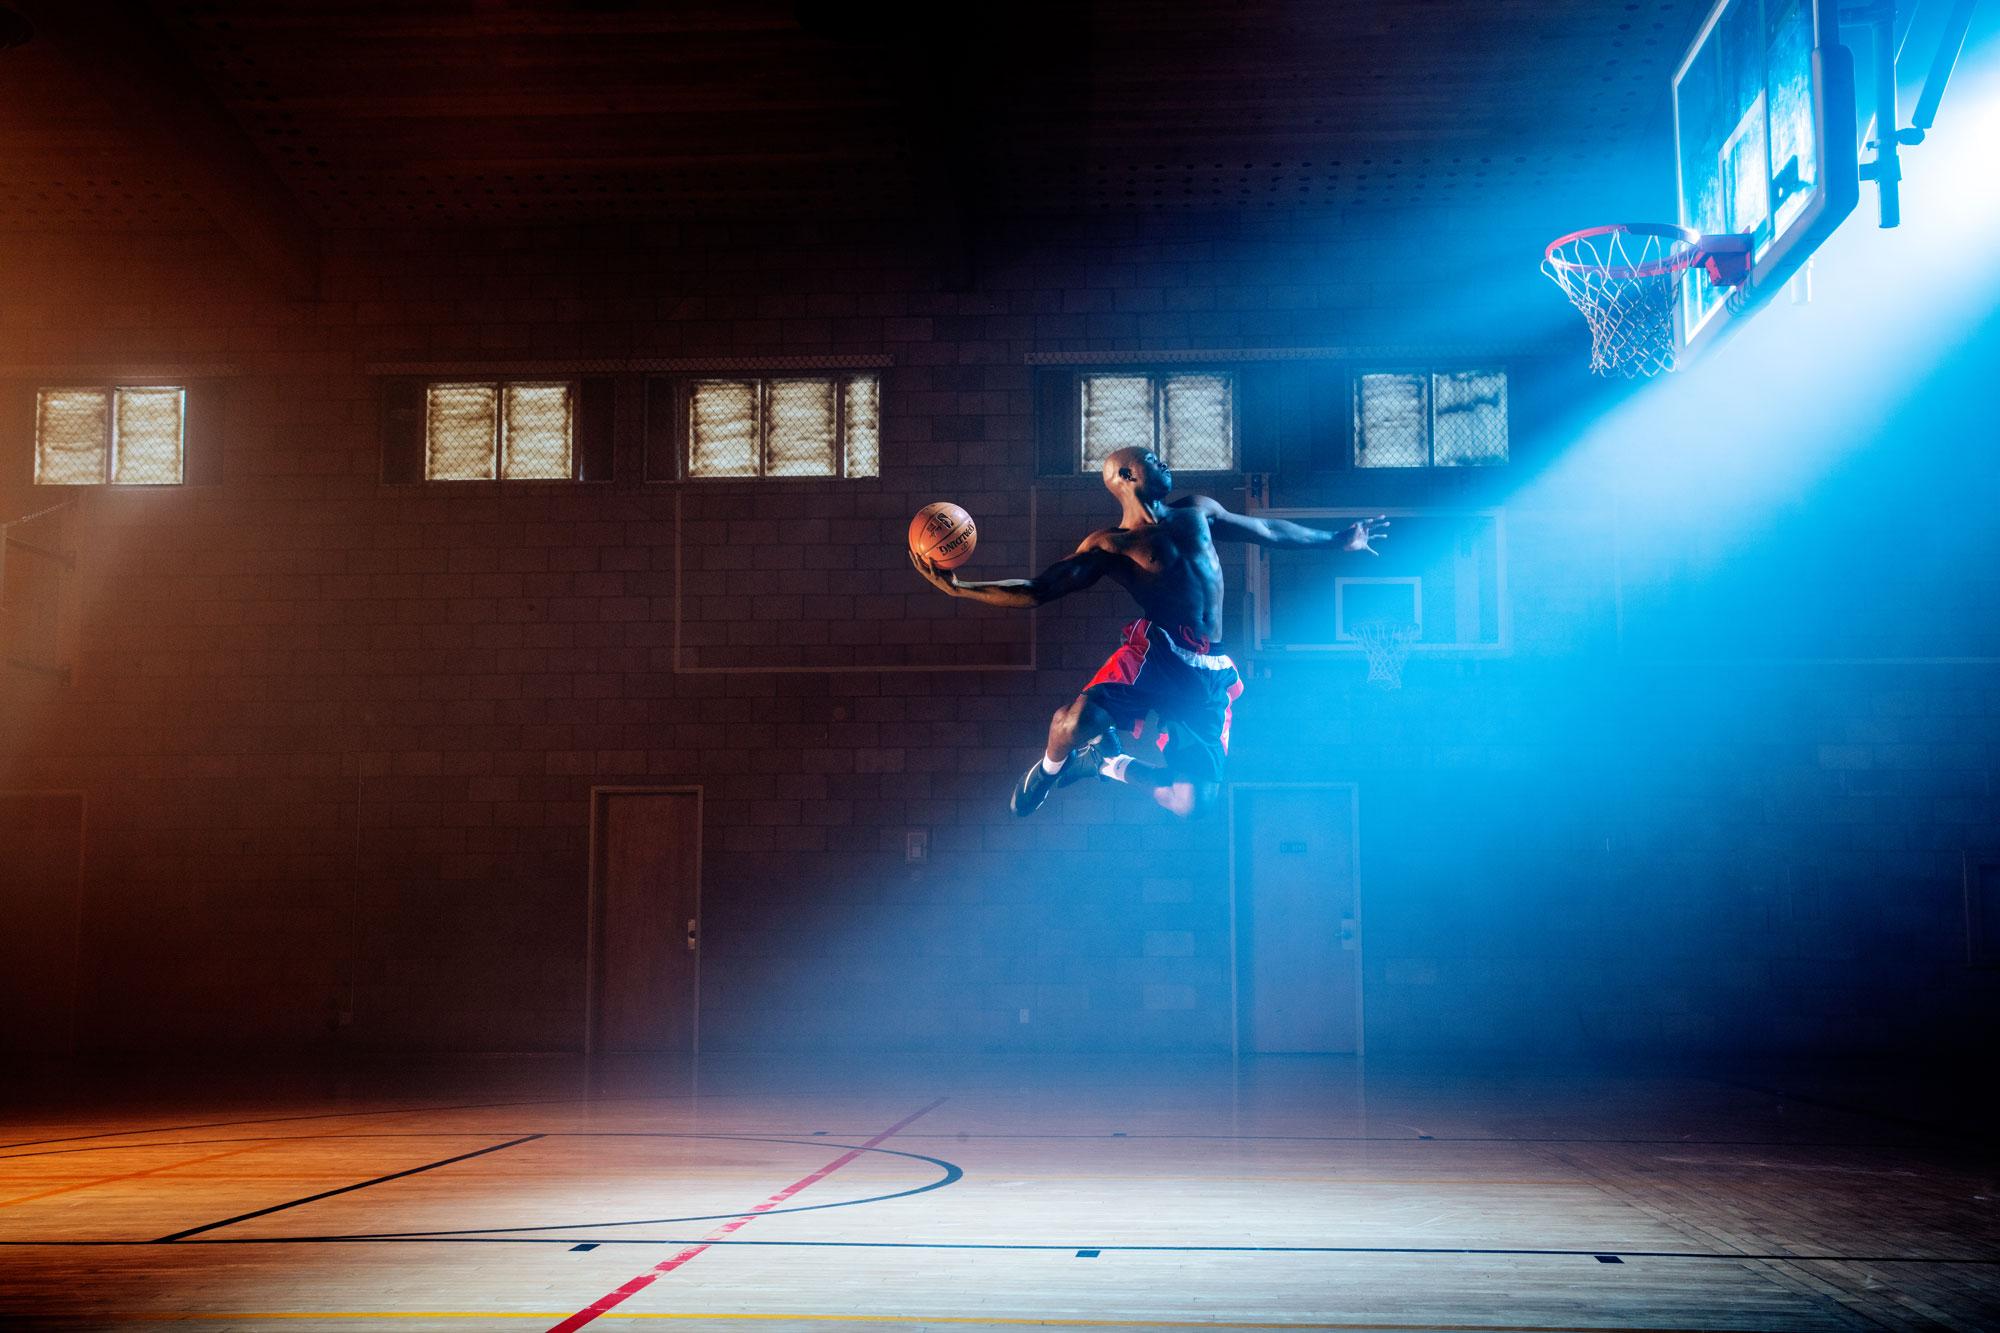 343-2018-07-03-Tyler-Basketball-Edit.jpg